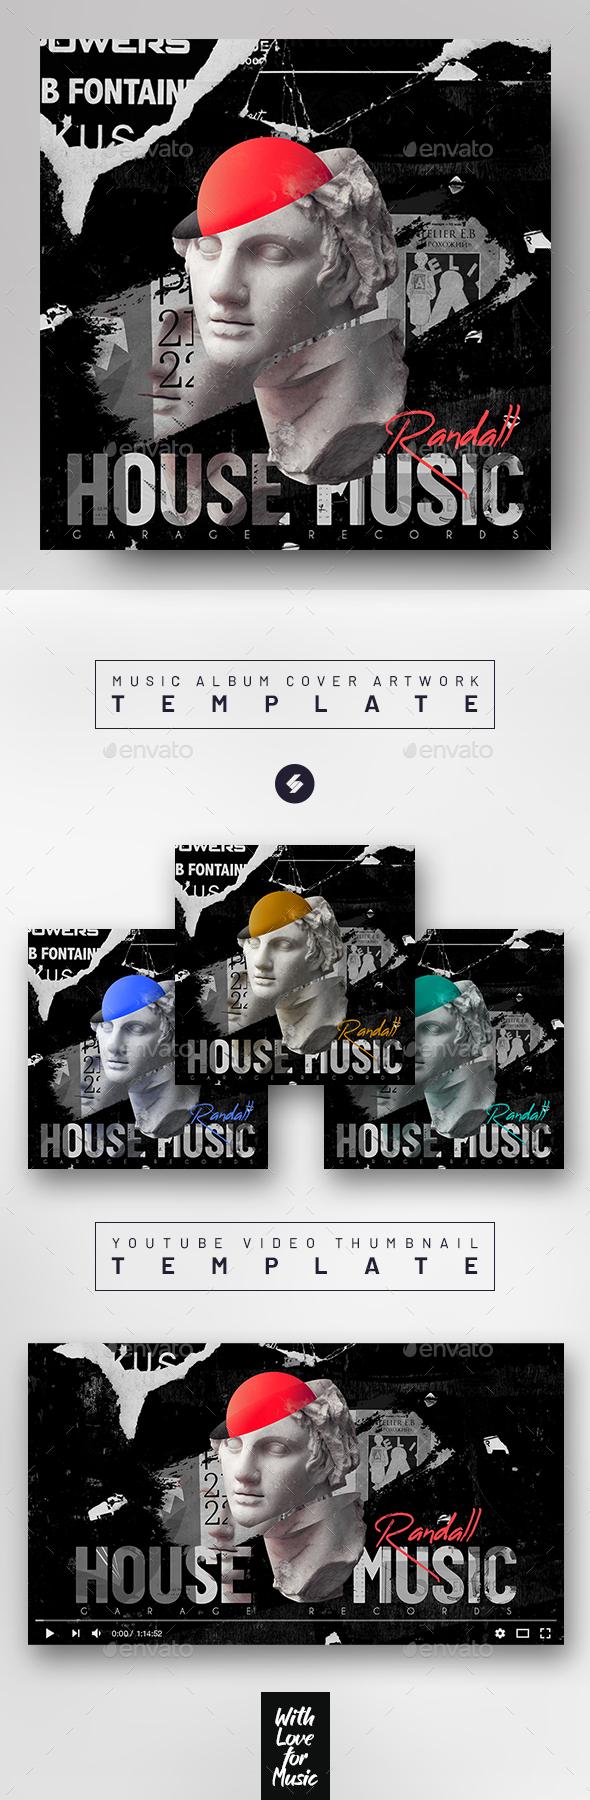 Garage House Music 05 – Album Cover Artwork Template